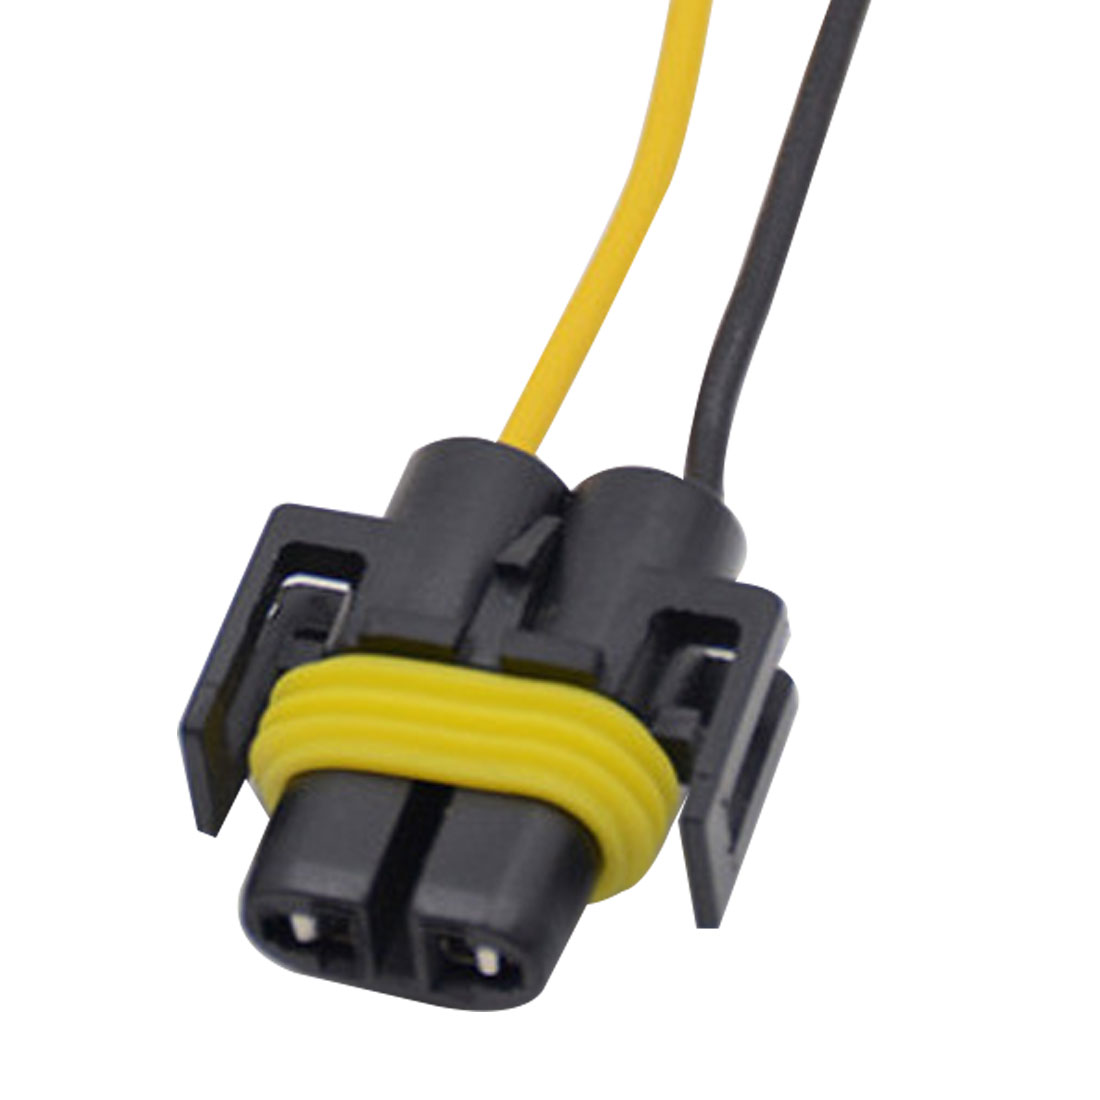 tonewan 2pcs h8 h11 wiring harness socket female adapter. Black Bedroom Furniture Sets. Home Design Ideas